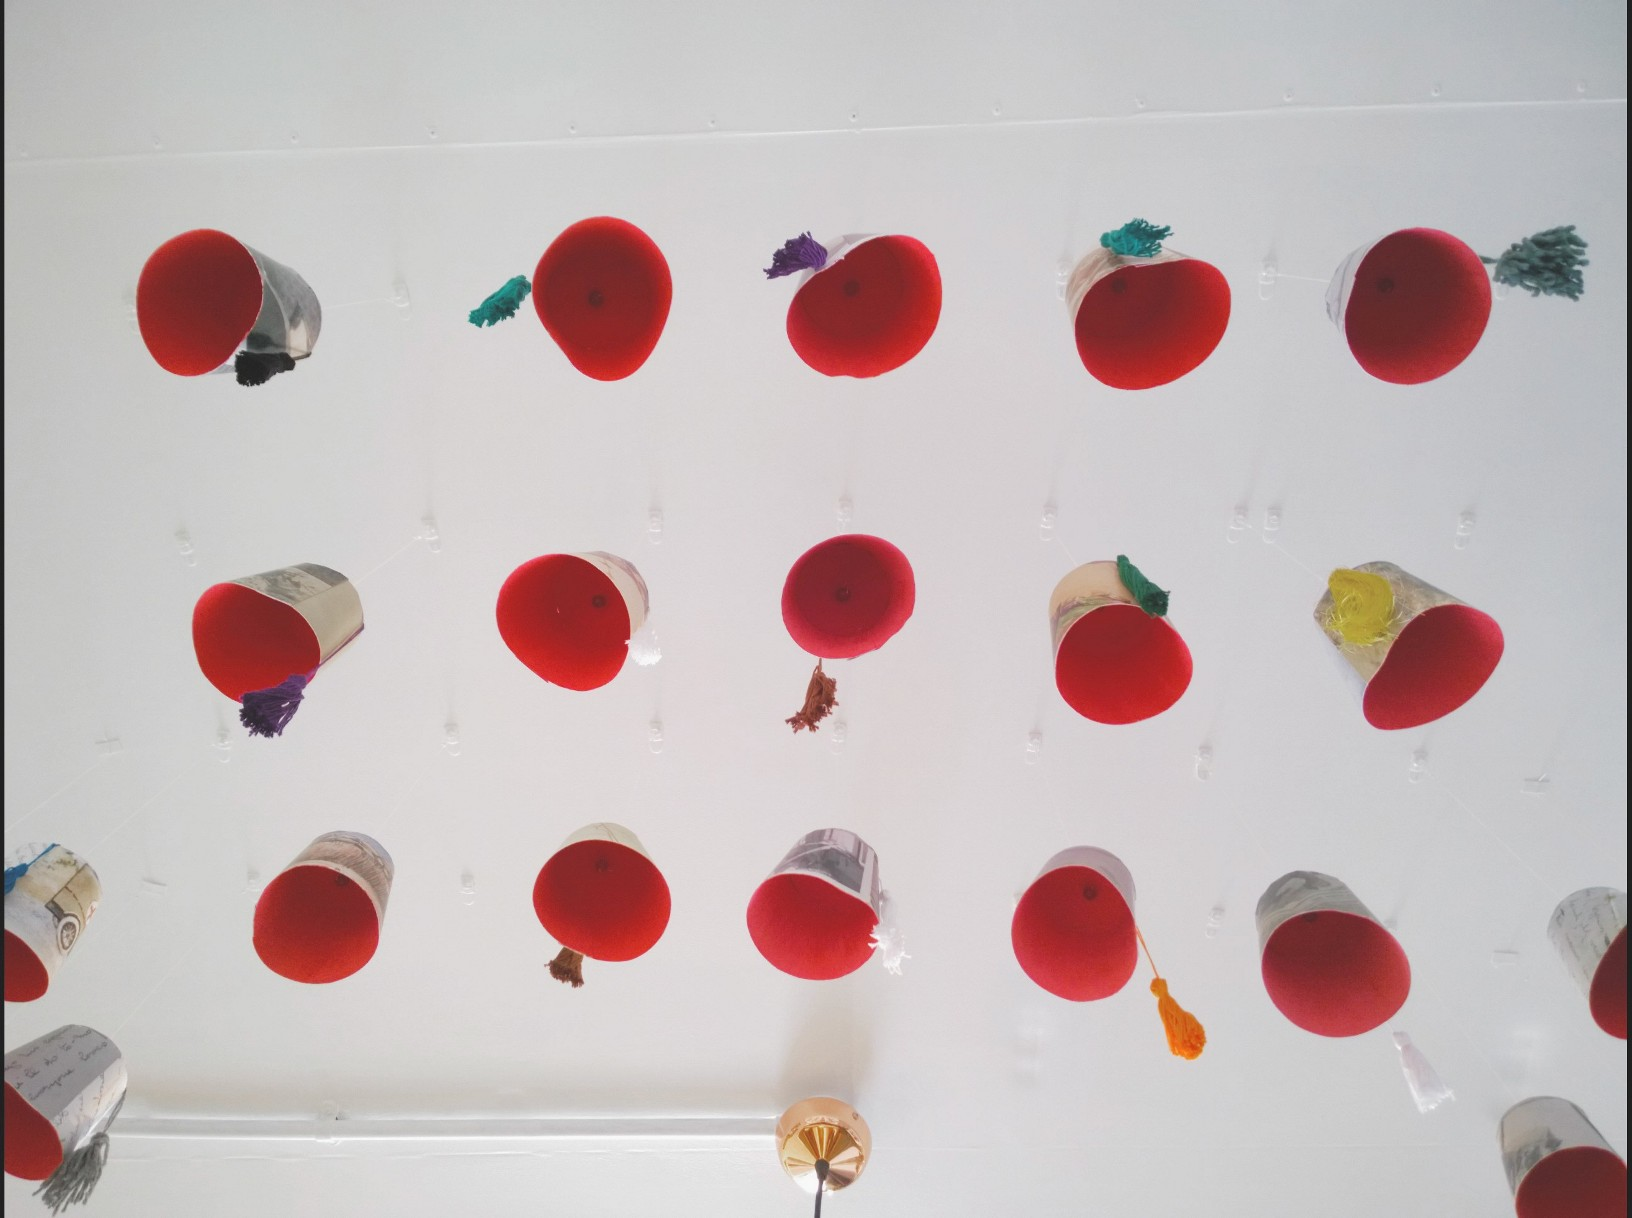 Fez Hats art installation